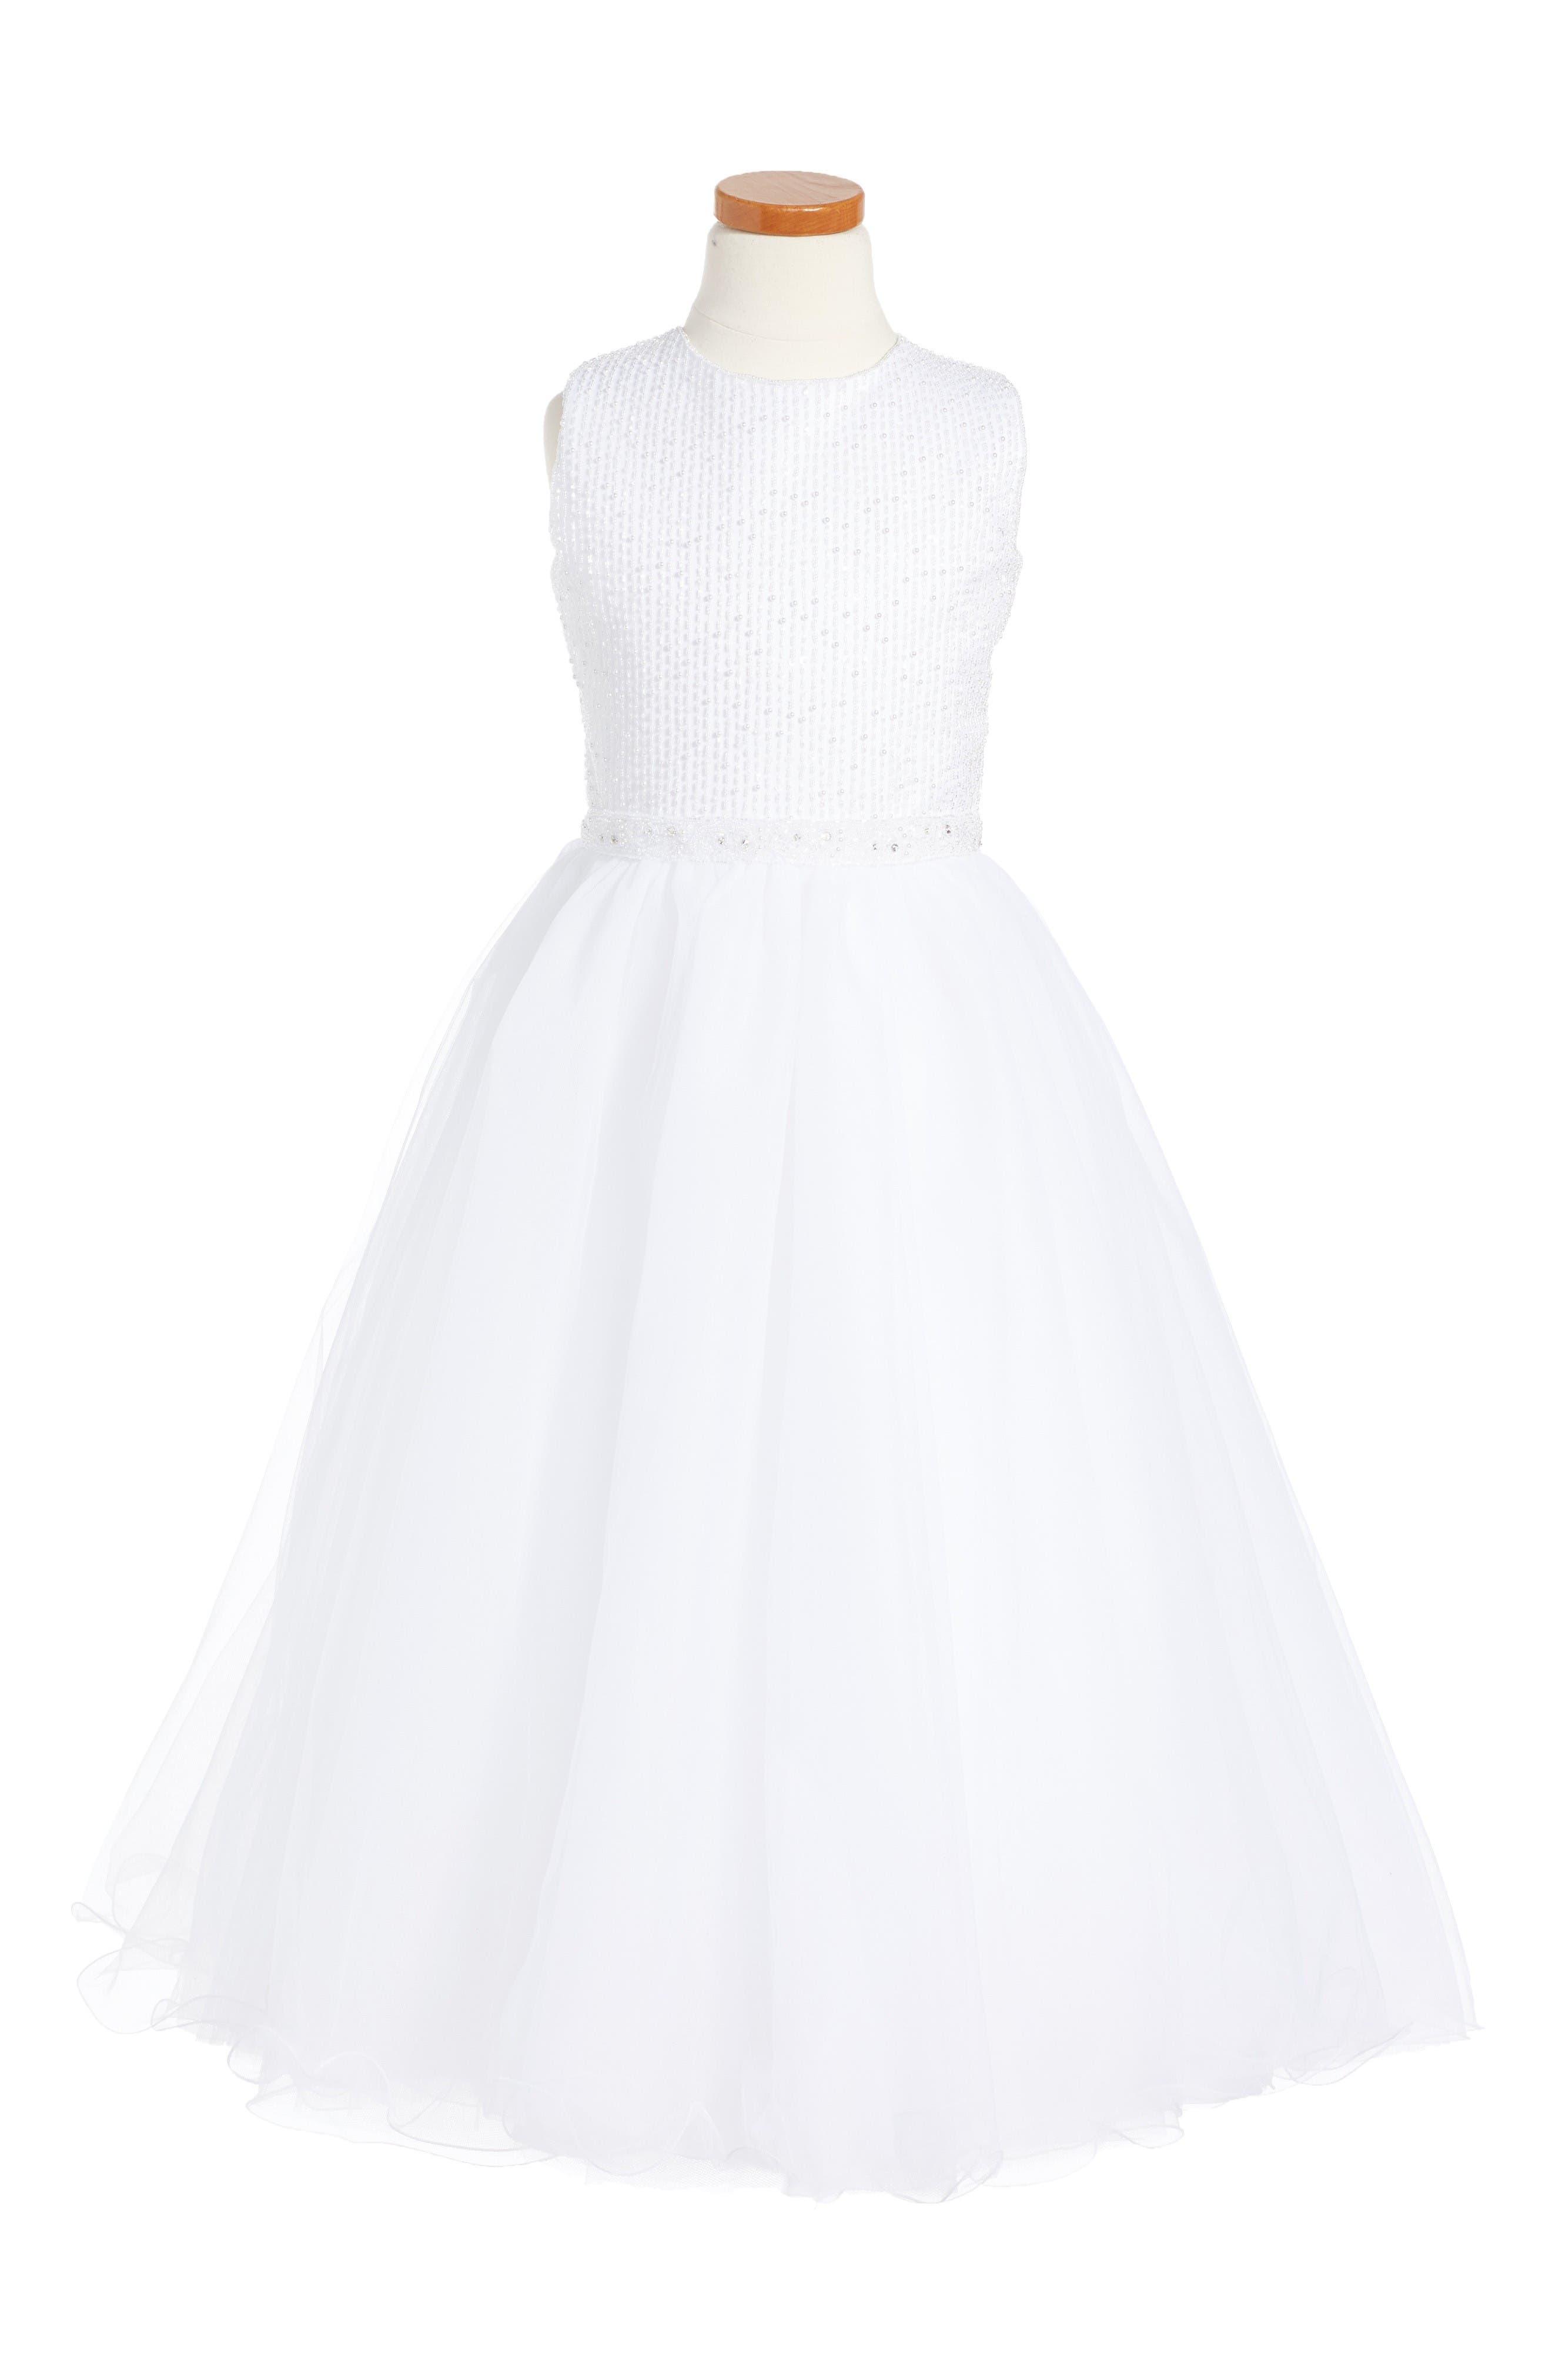 JOAN CALABRESE FOR MON CHERI Beaded Satin & Tulle First Communion Dress